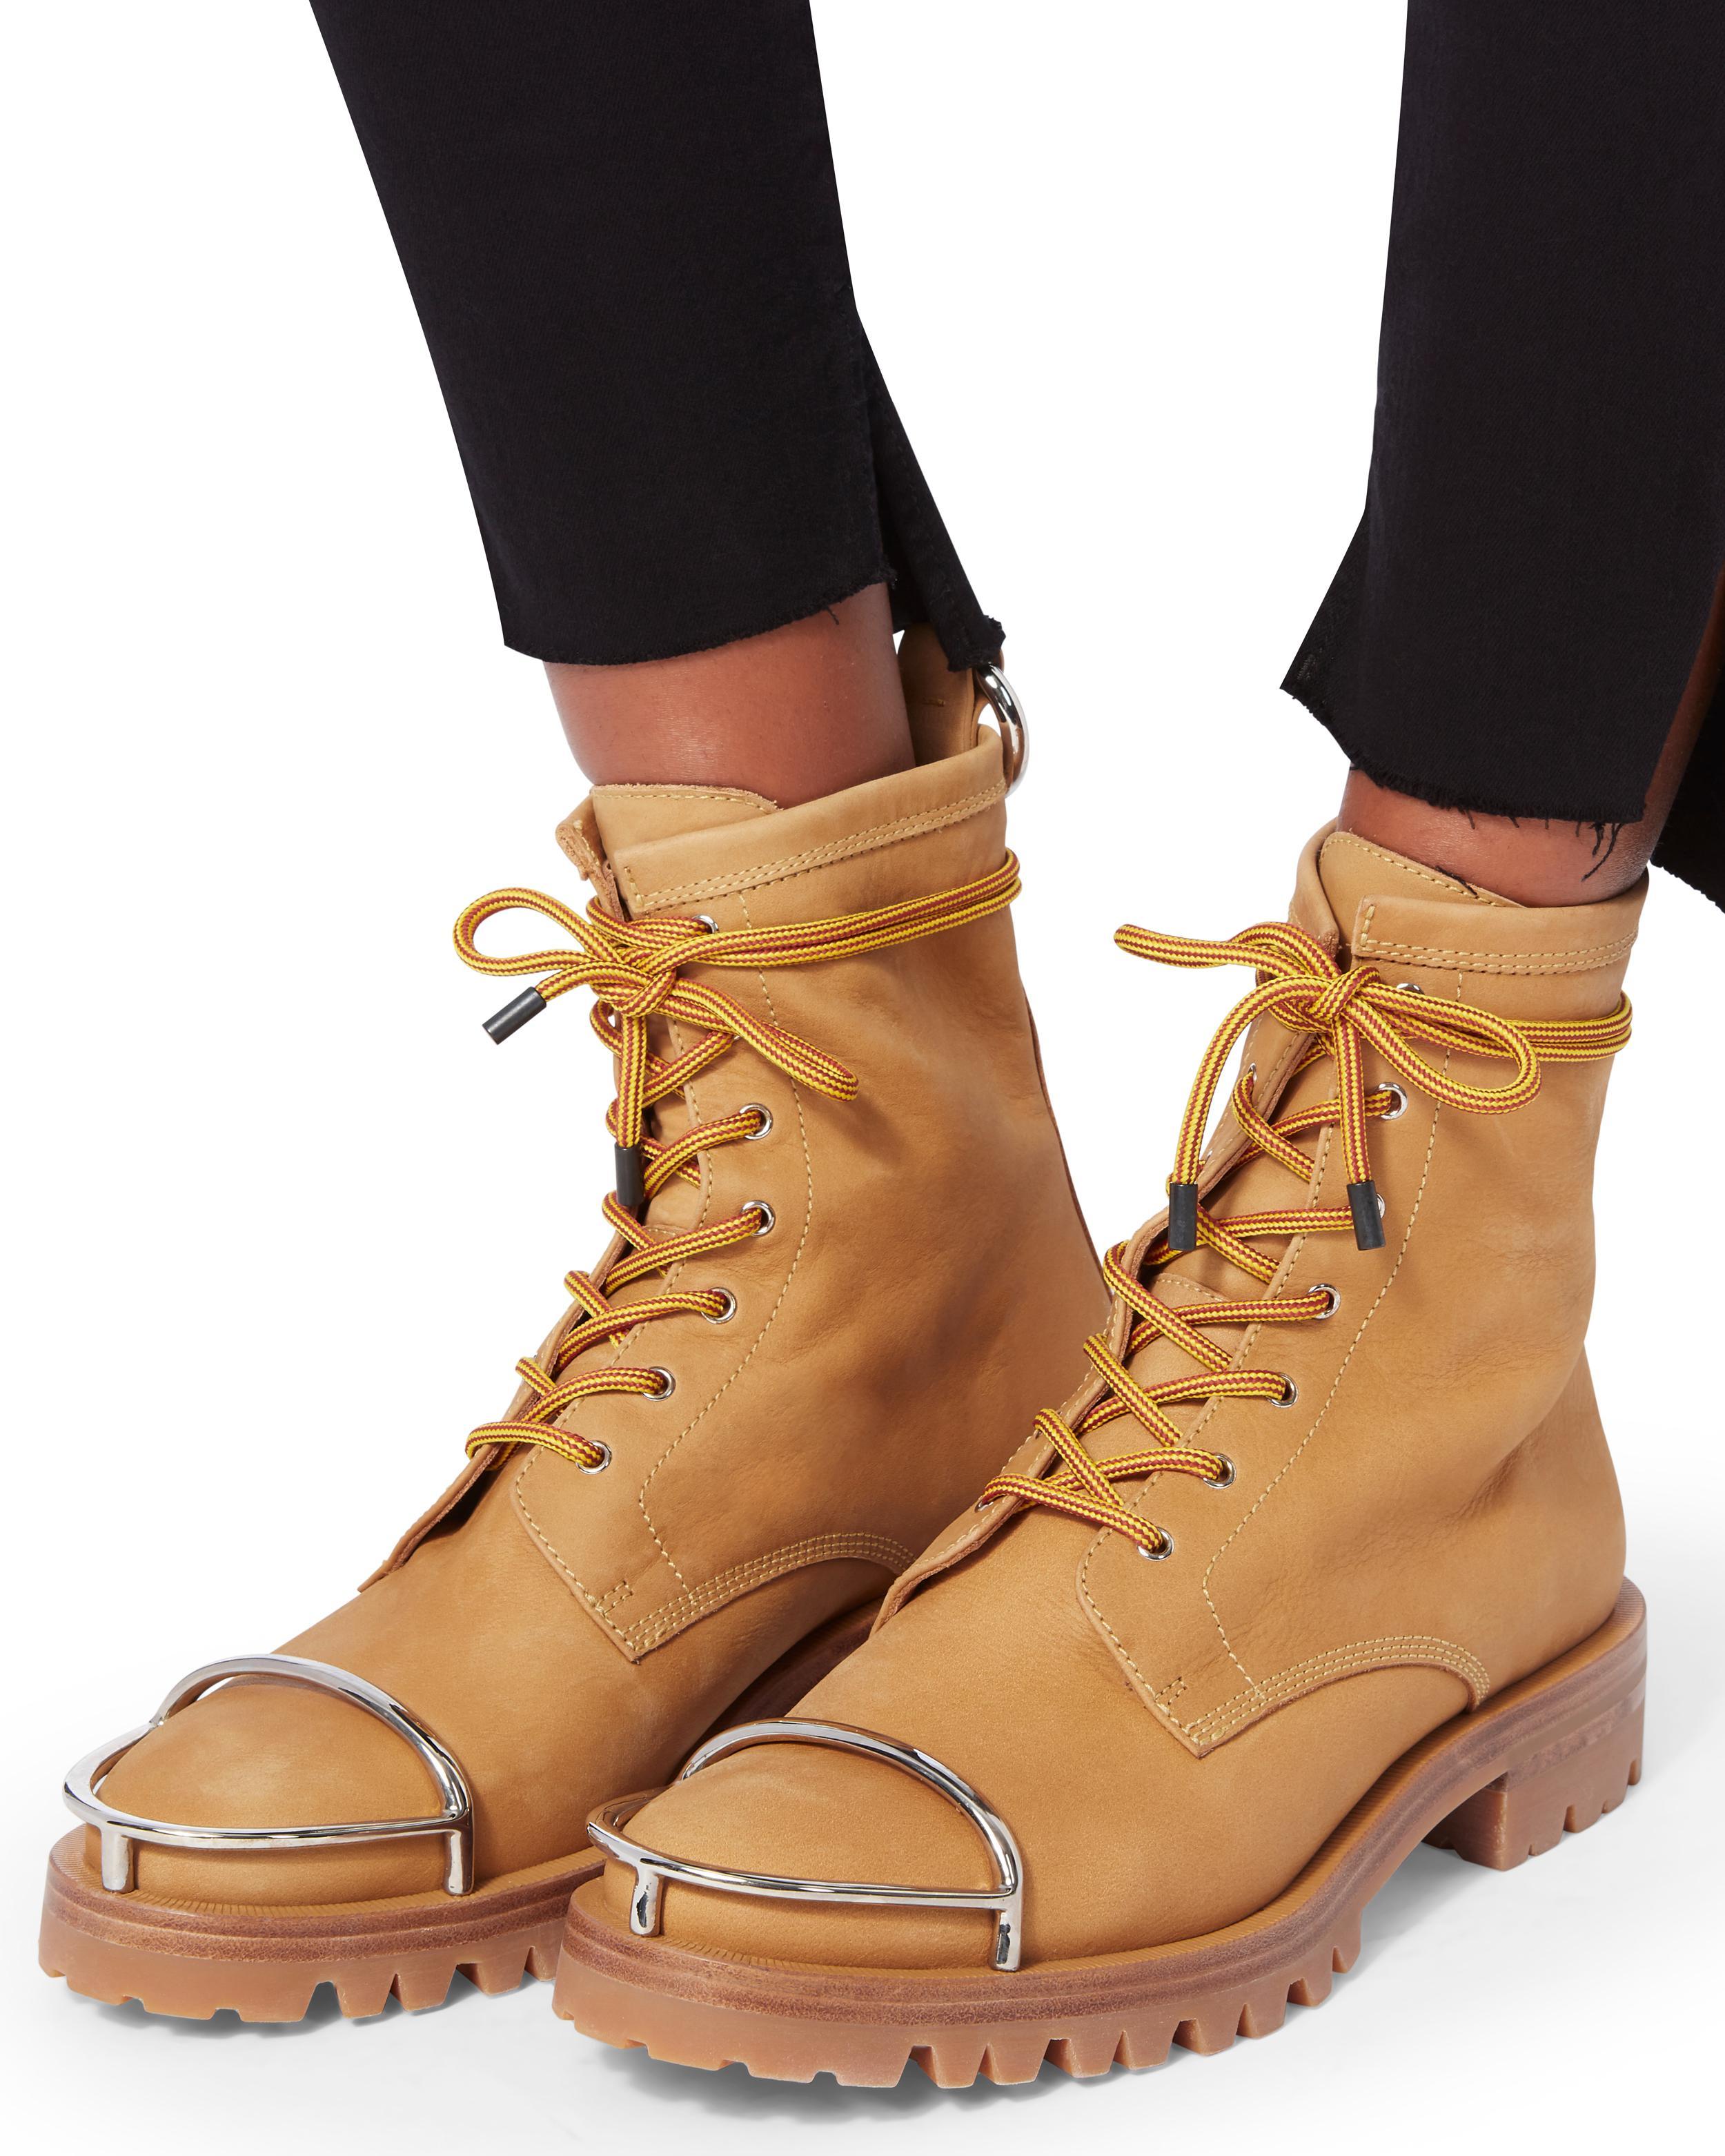 Alexander Wang Nubuck Platform Boots hot sale sale online 8MCKI